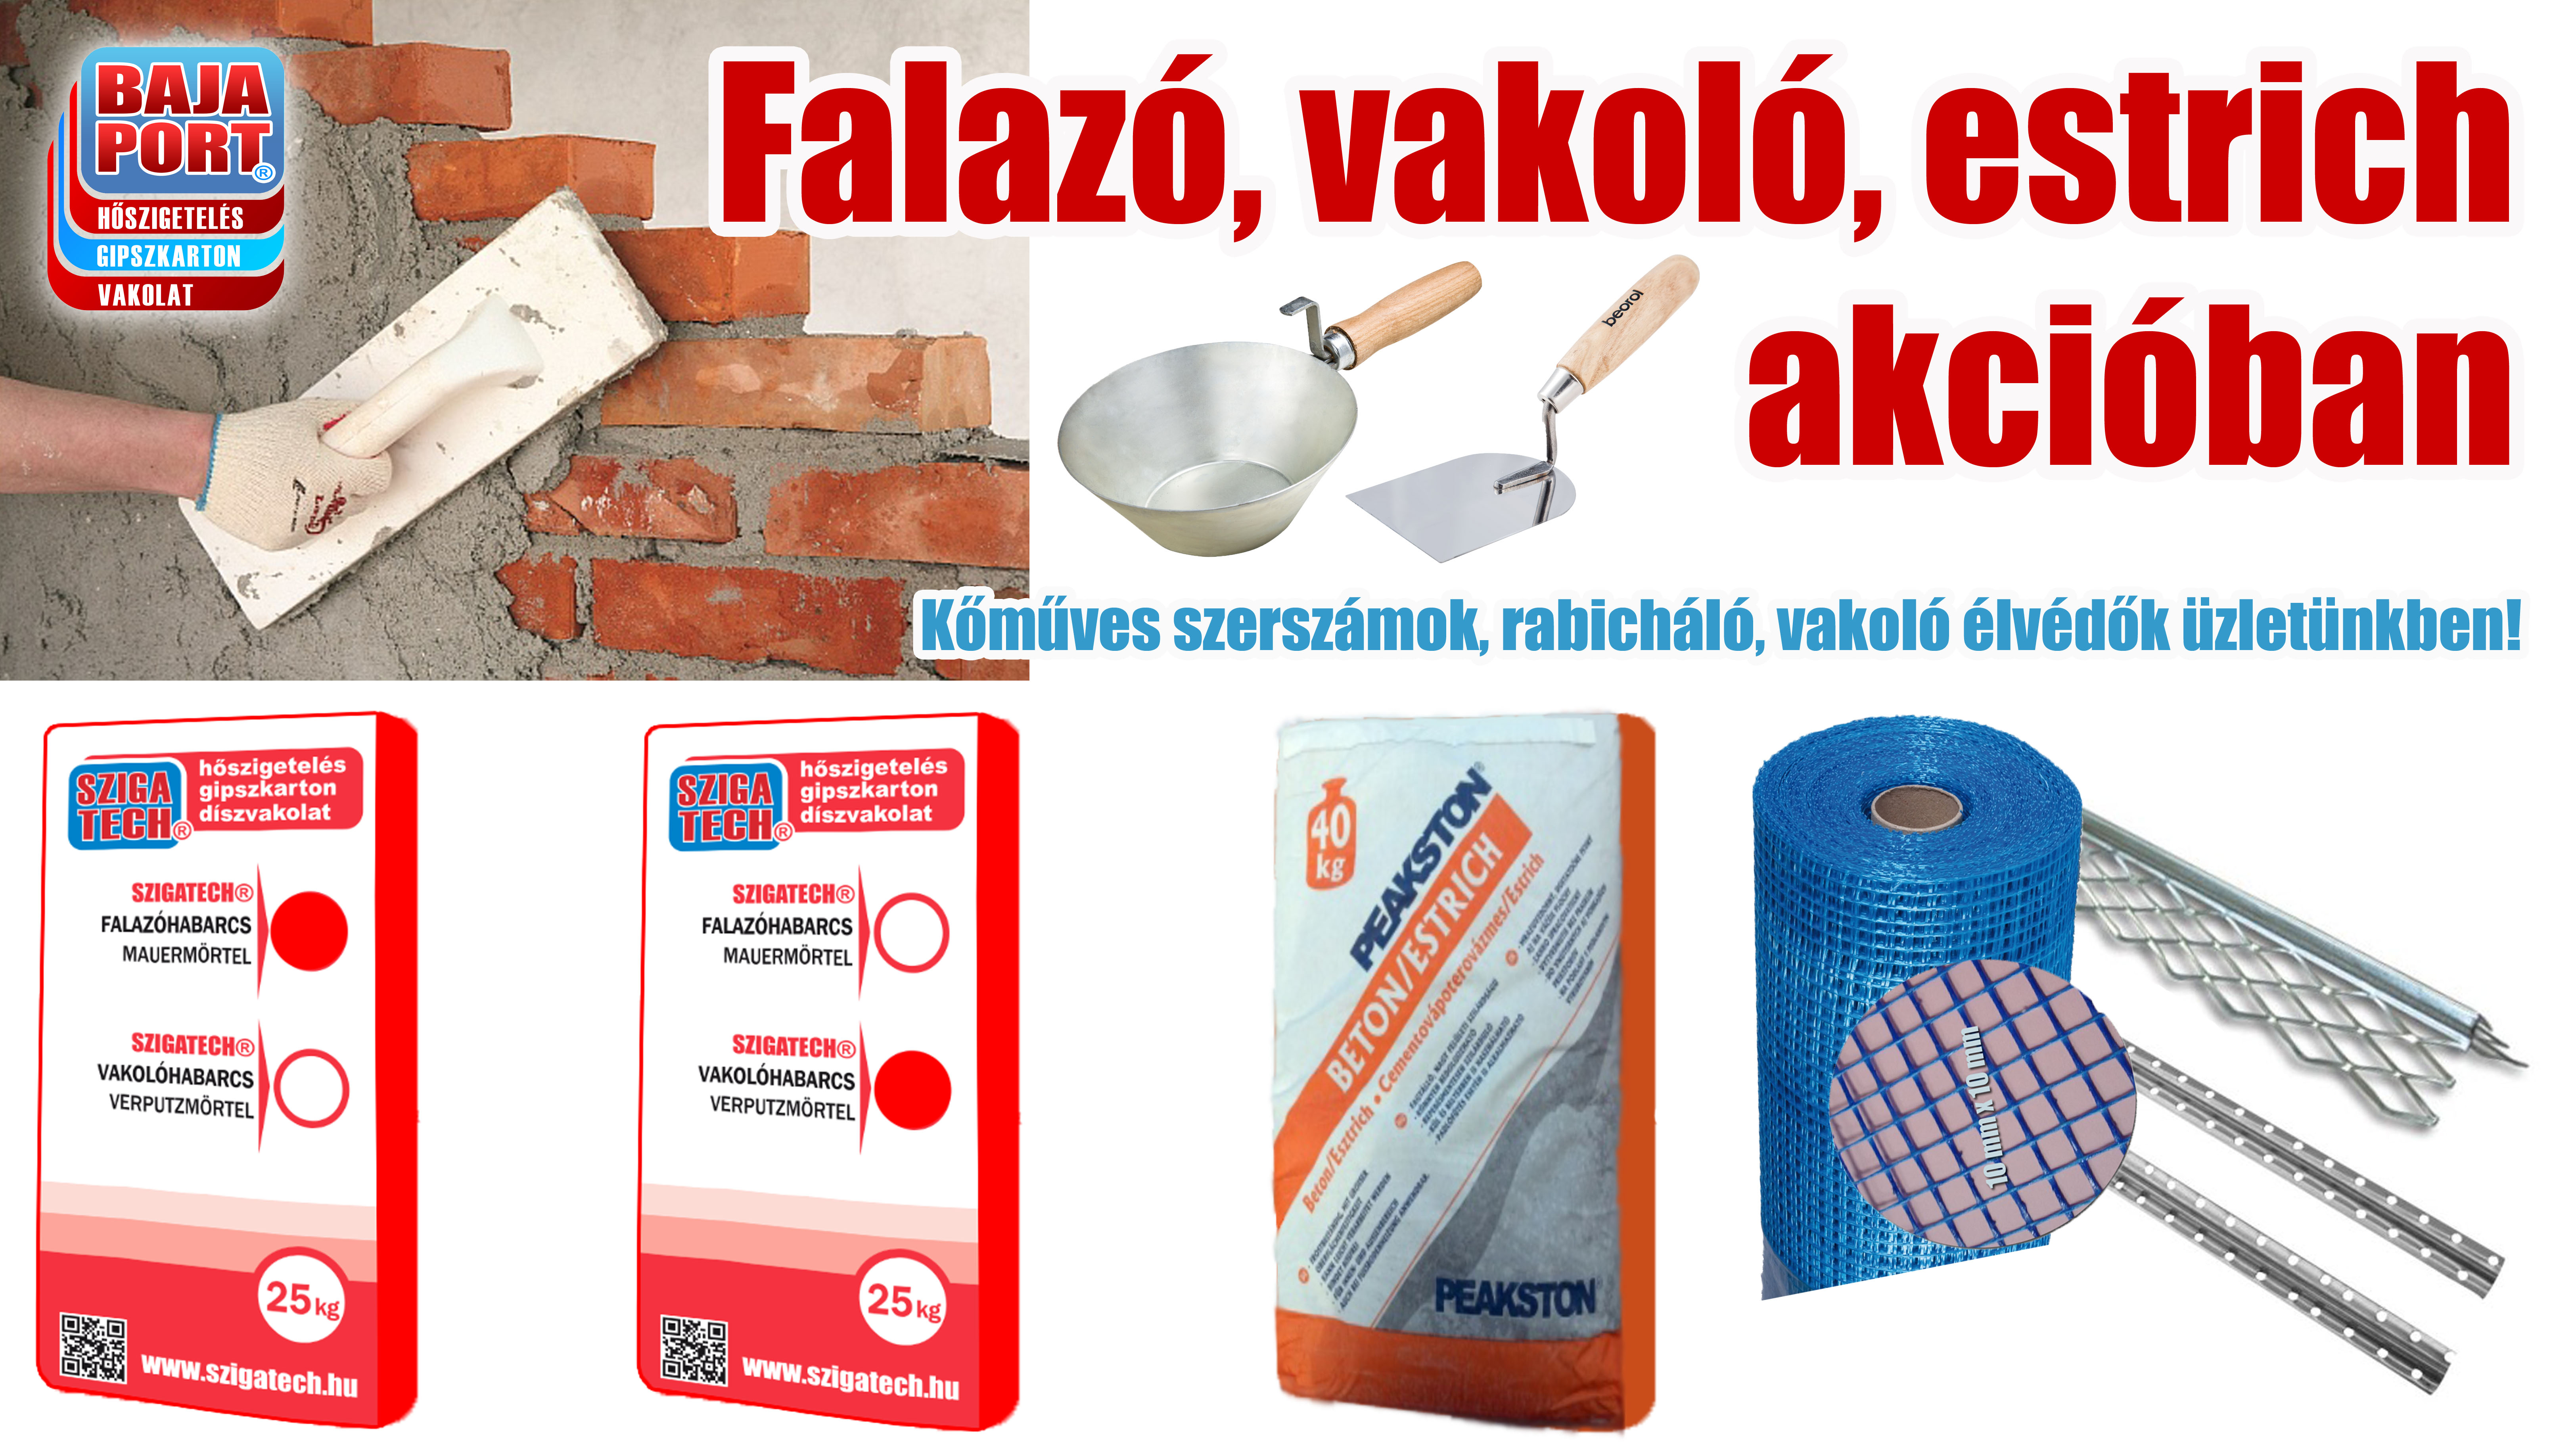 falazo-vakolo-estrich-akcio